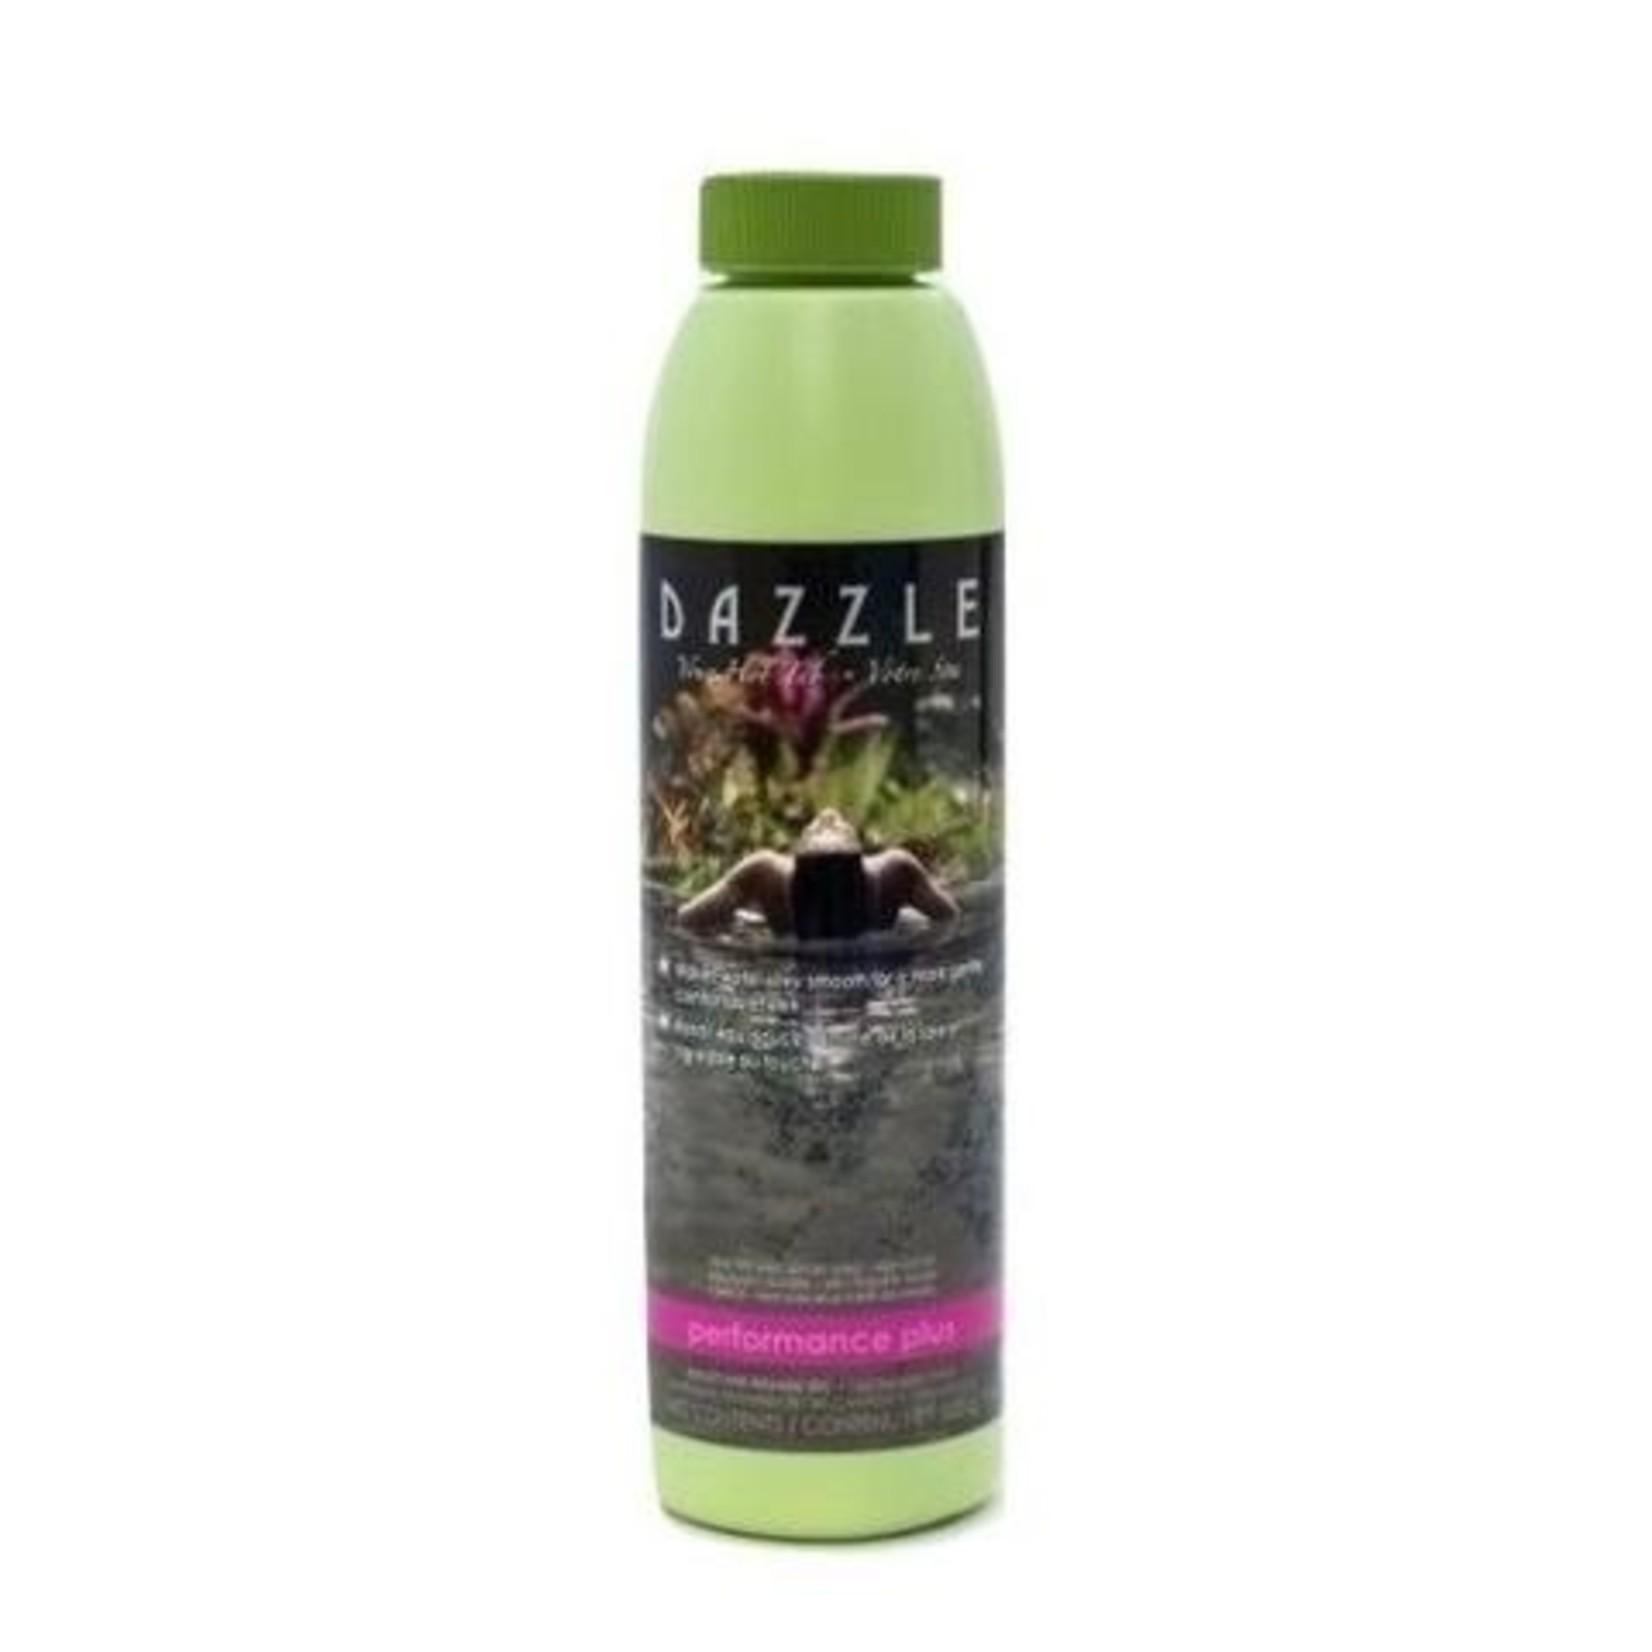 Dazzle Performance Plus (625 g)